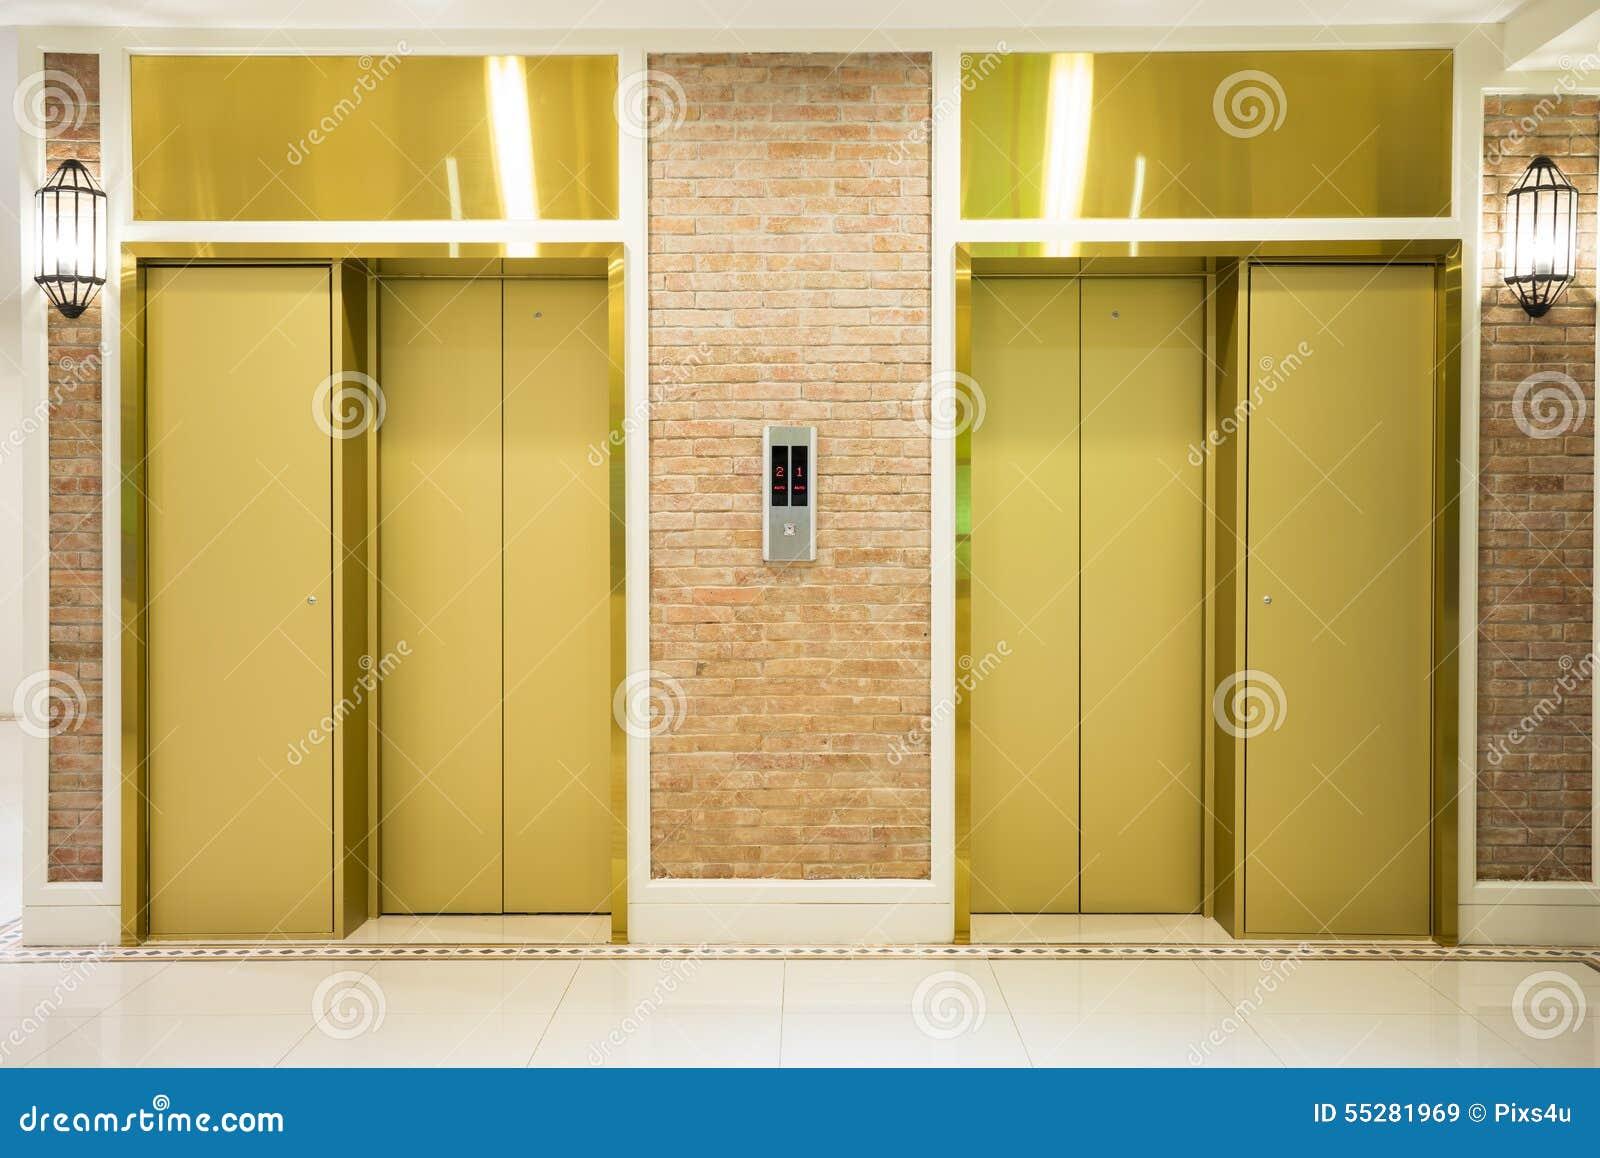 Two elevator doors royalty free stock image